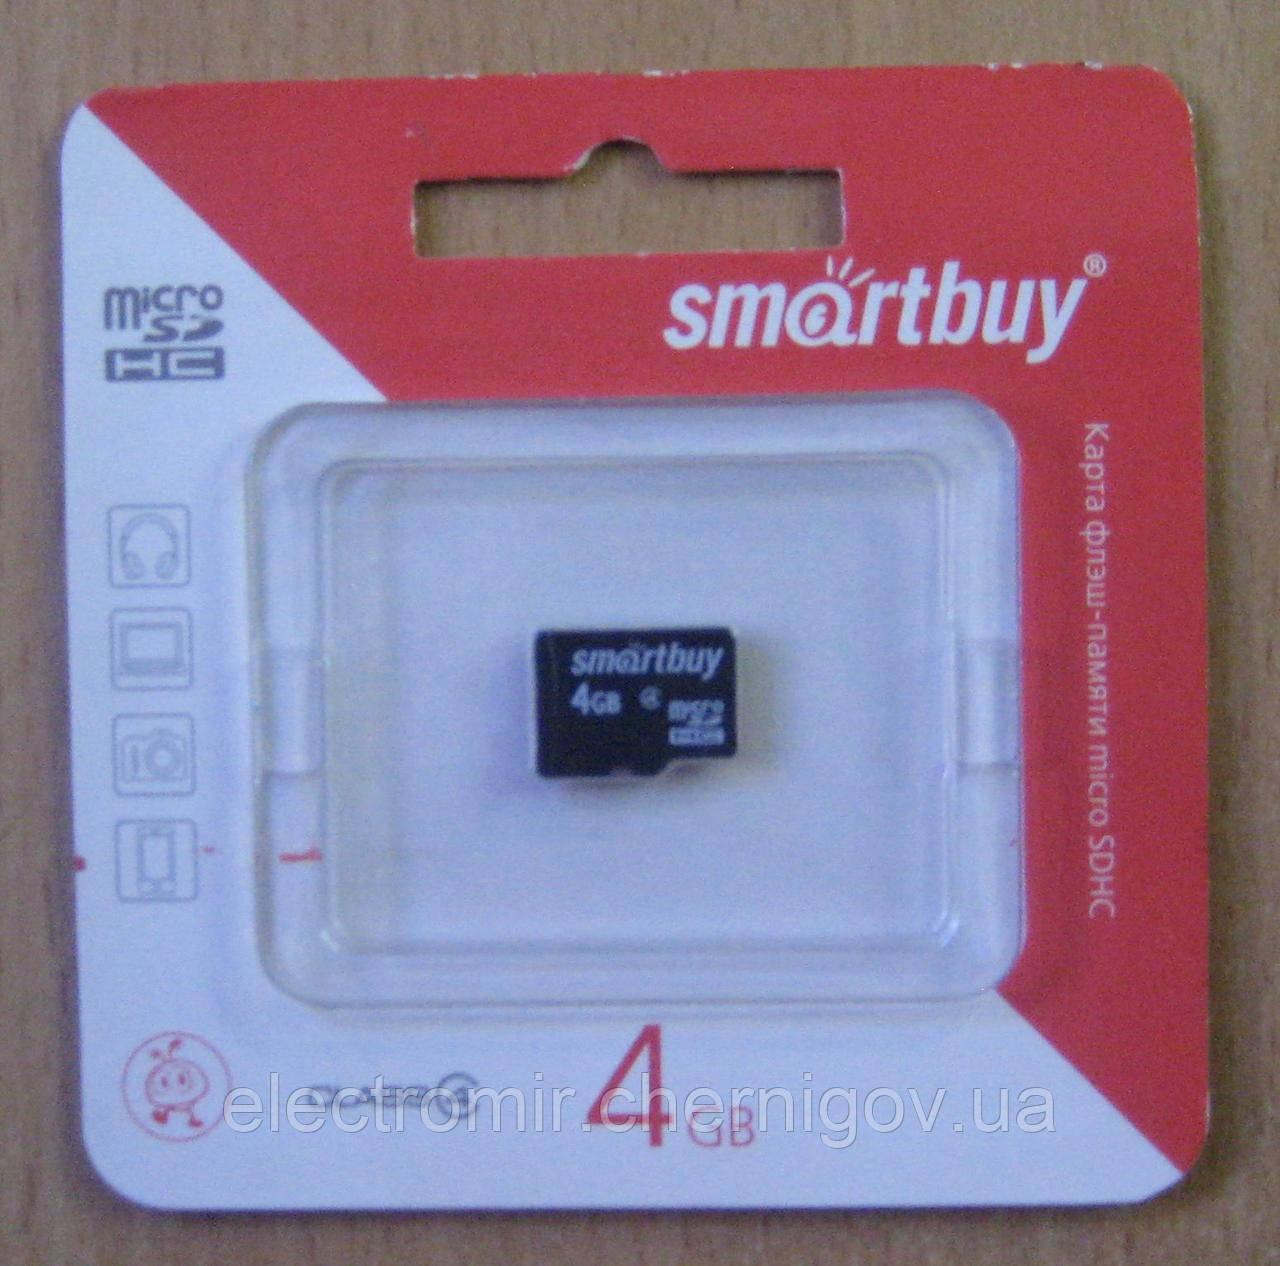 Карта памяти microSD Smartbuy 4GB 4 class